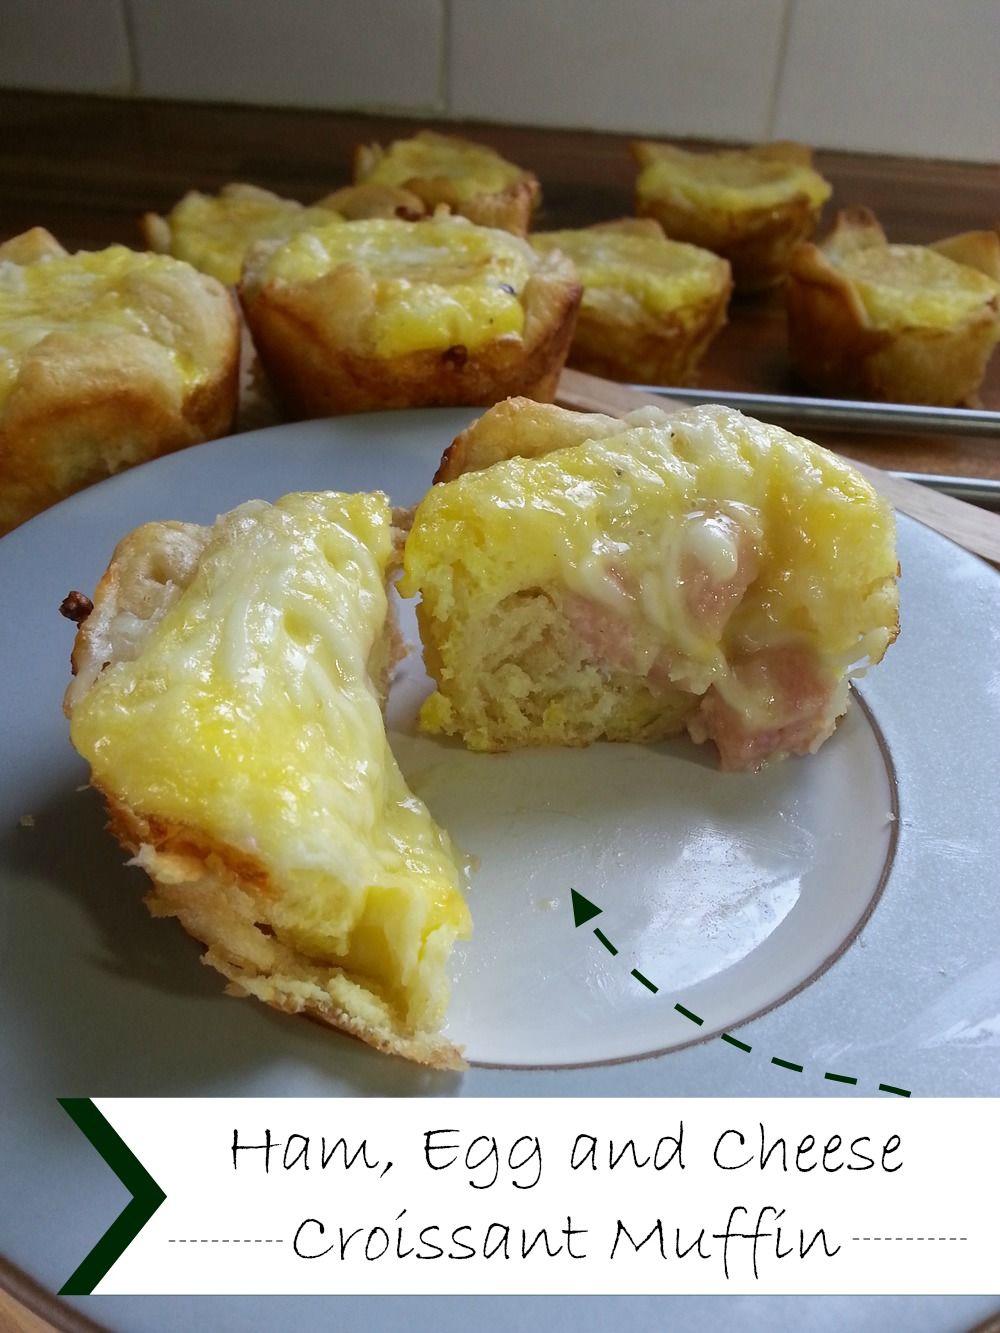 Ham, Egg and Cheese Croissant Muffins #GoAllNatural #WeaveMade #ad #SmithfieldAllNatural @smithfieldfoods